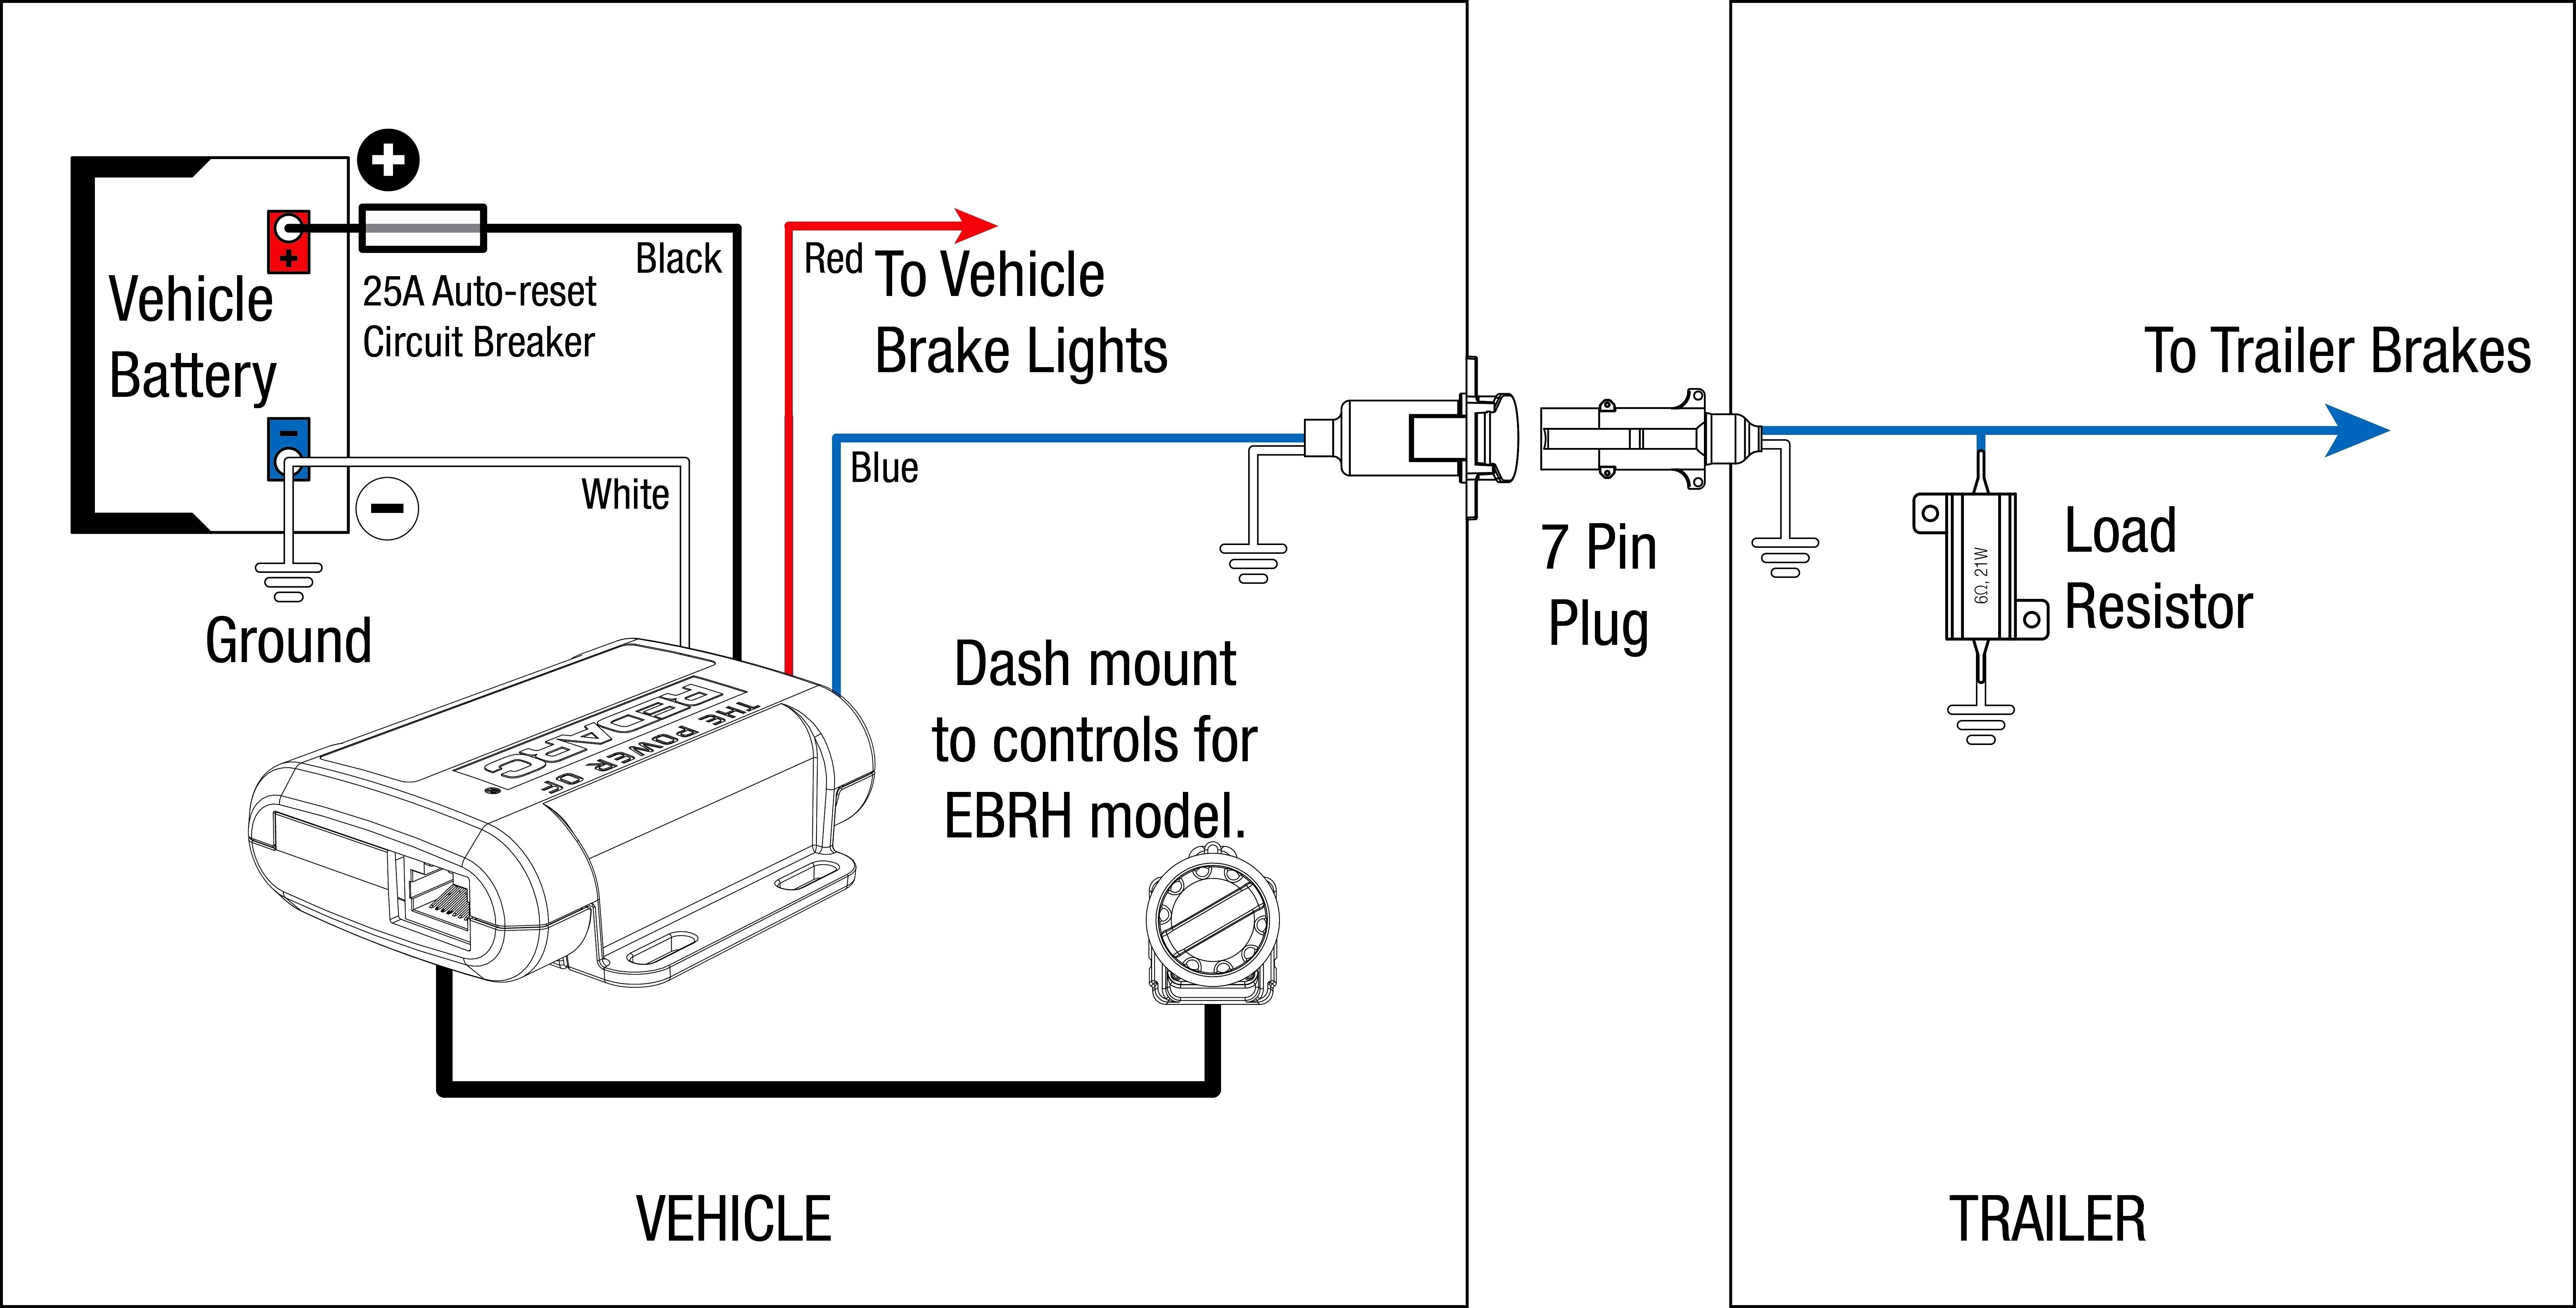 4 pin trailer ke controller wiring best site wiring diagram rh bruceborowsky com 7 Pin RV Wiring 12 Pin Wiring Harness